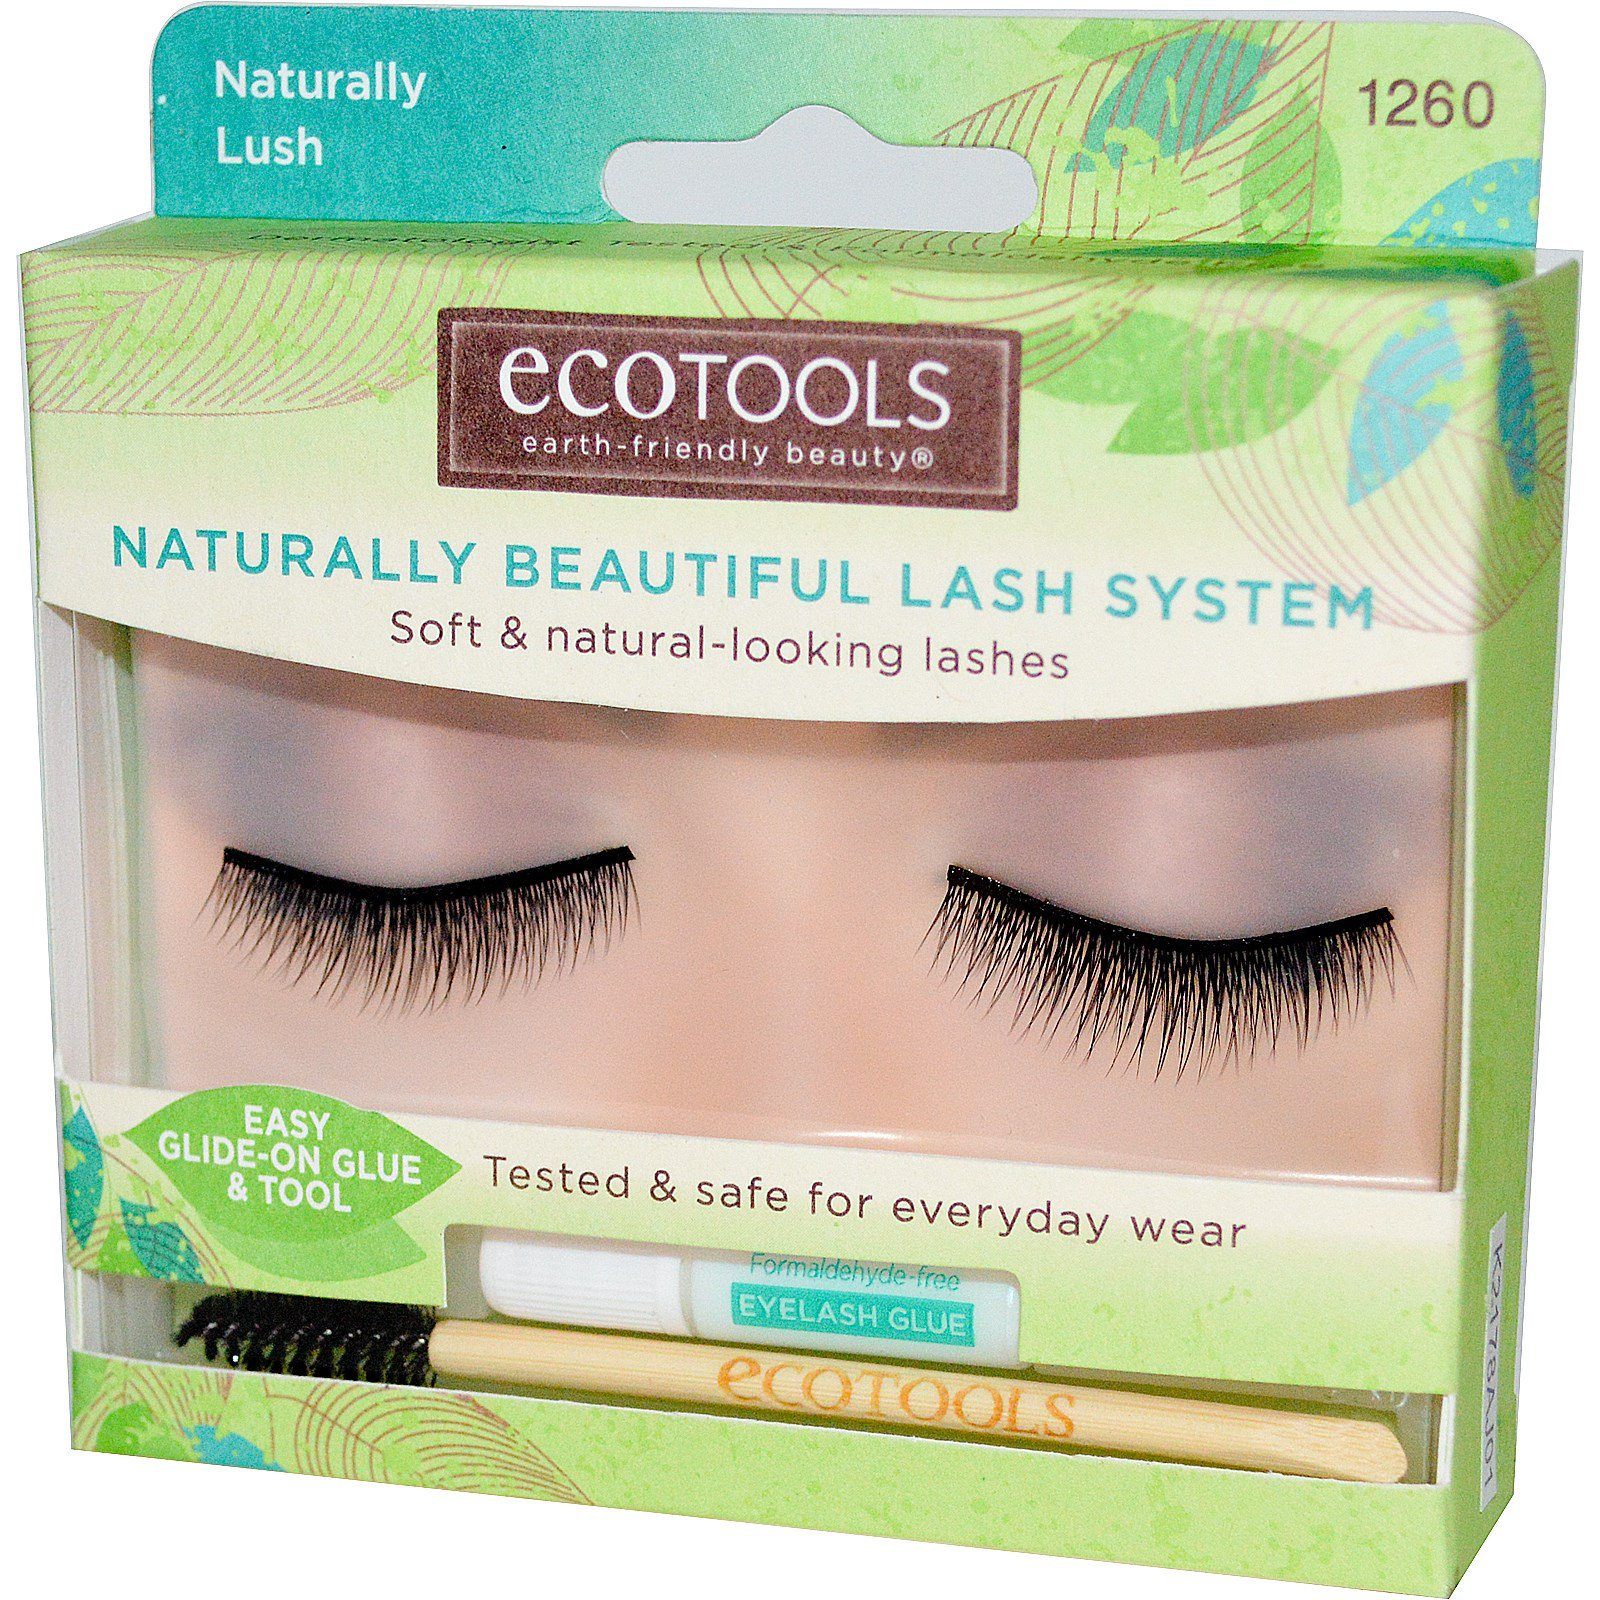 Ecotools Naturally Beautiful Lash System Naturally Lush 1 Pair Of